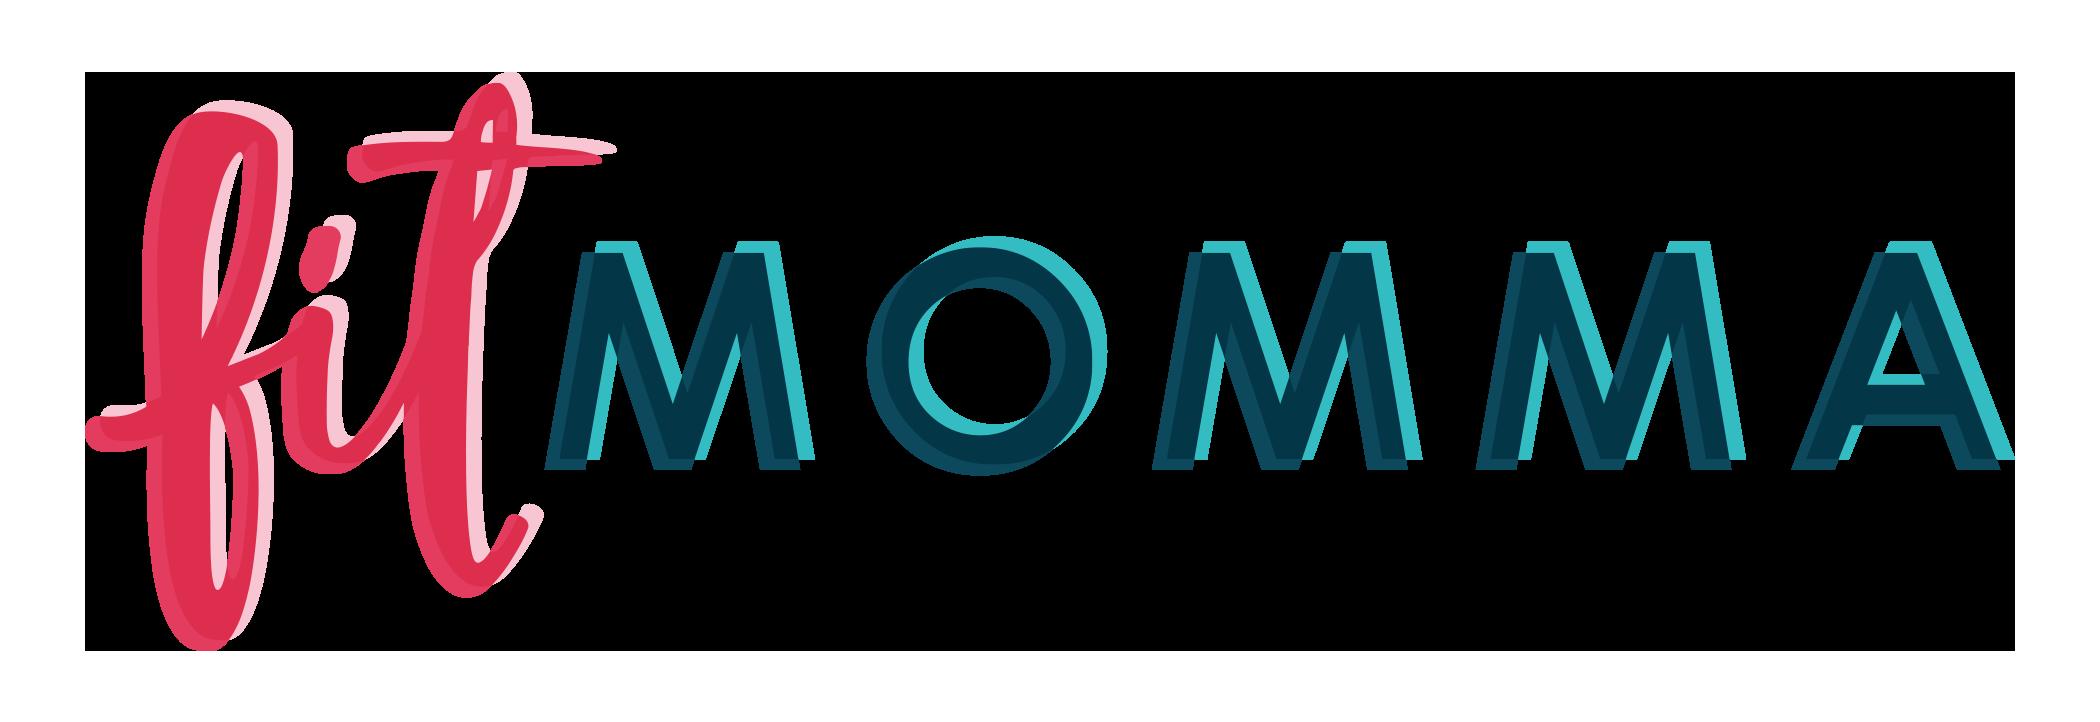 Clipart mom fitness. Fitmomma inspiring moms through